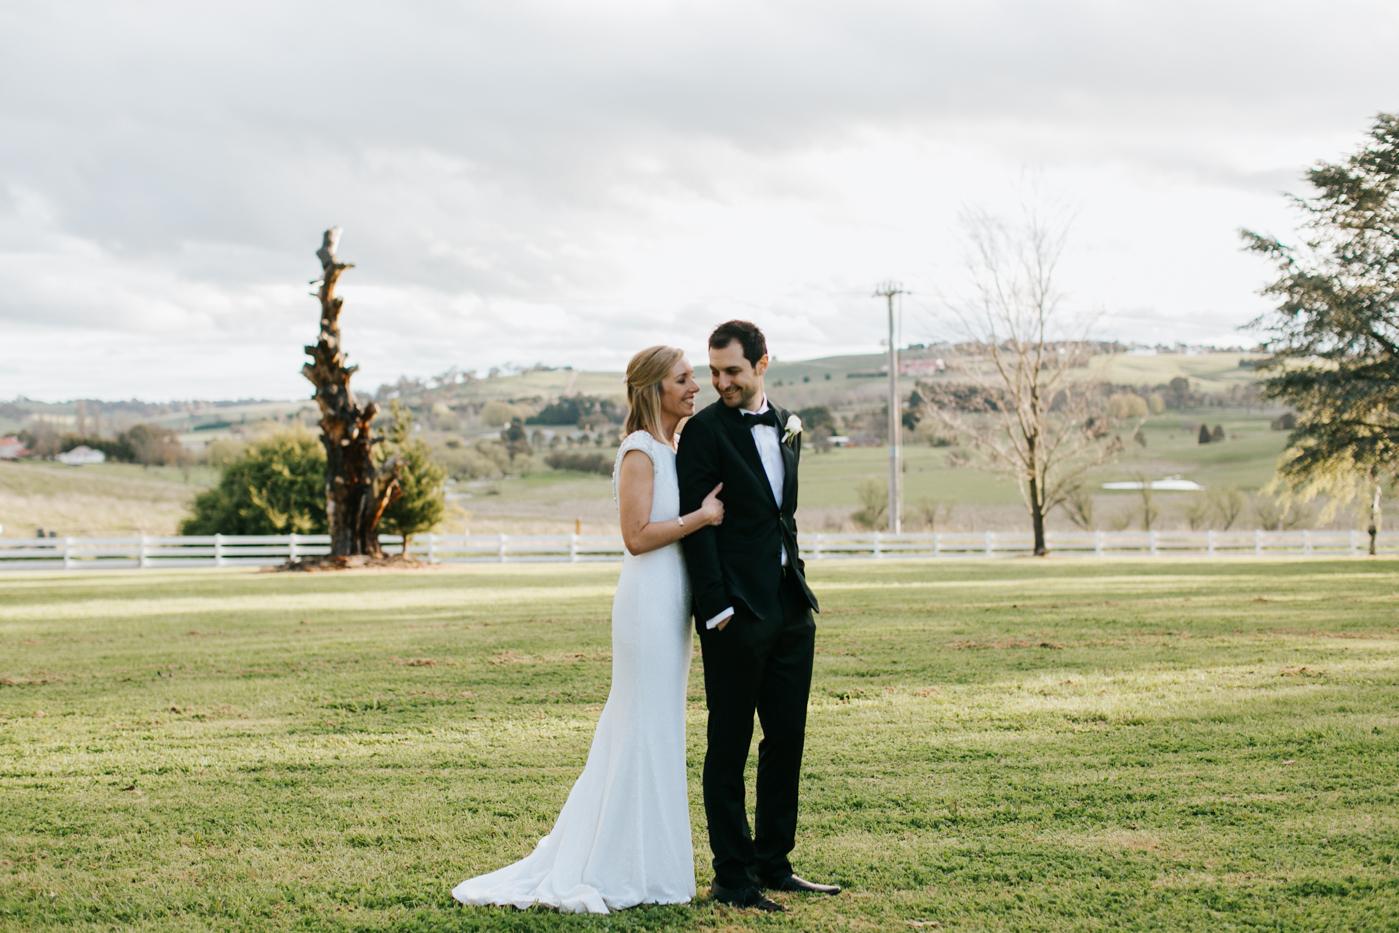 Bridget & James - Orange Country Wedding - Samantha Heather Photography-153.jpg